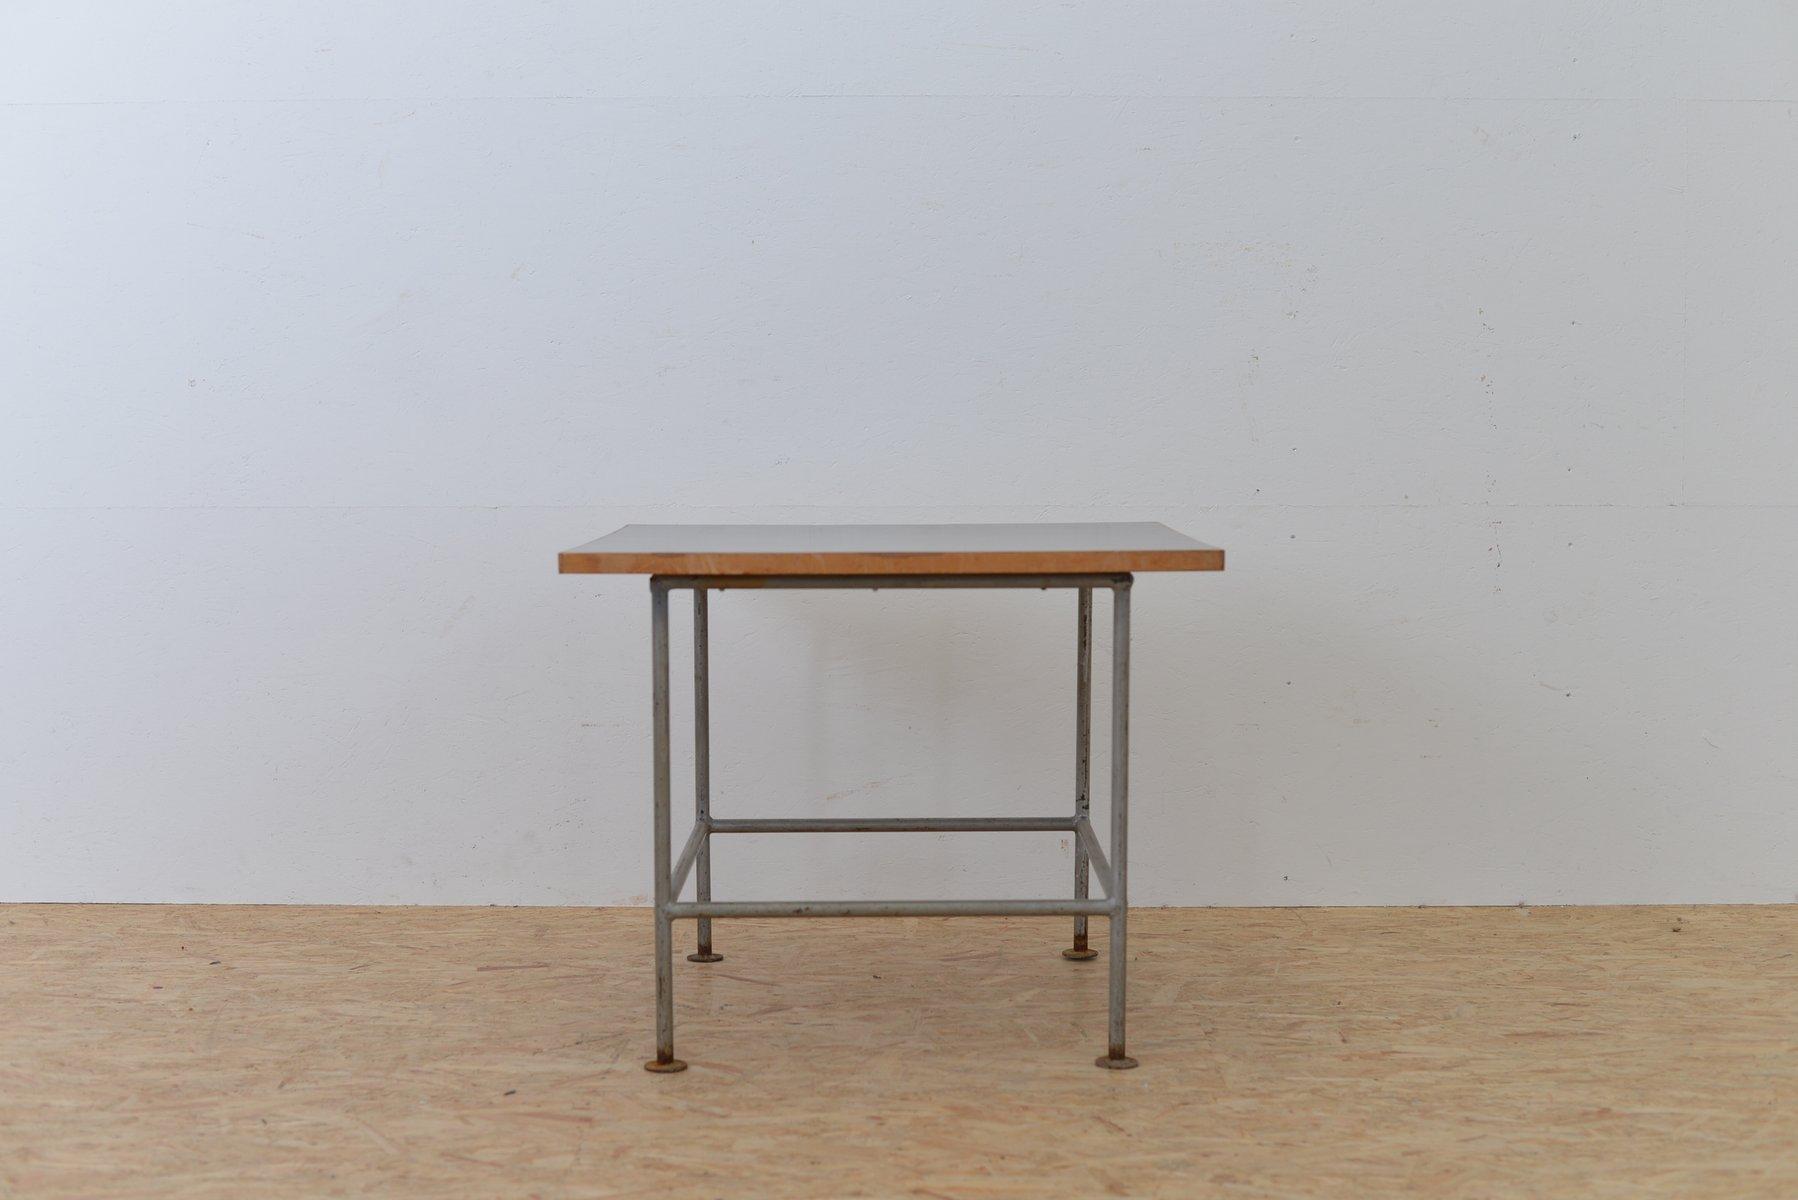 Superieur Vintage Metal Side Table With Black Top 7. $1,373.00. Price Per Piece